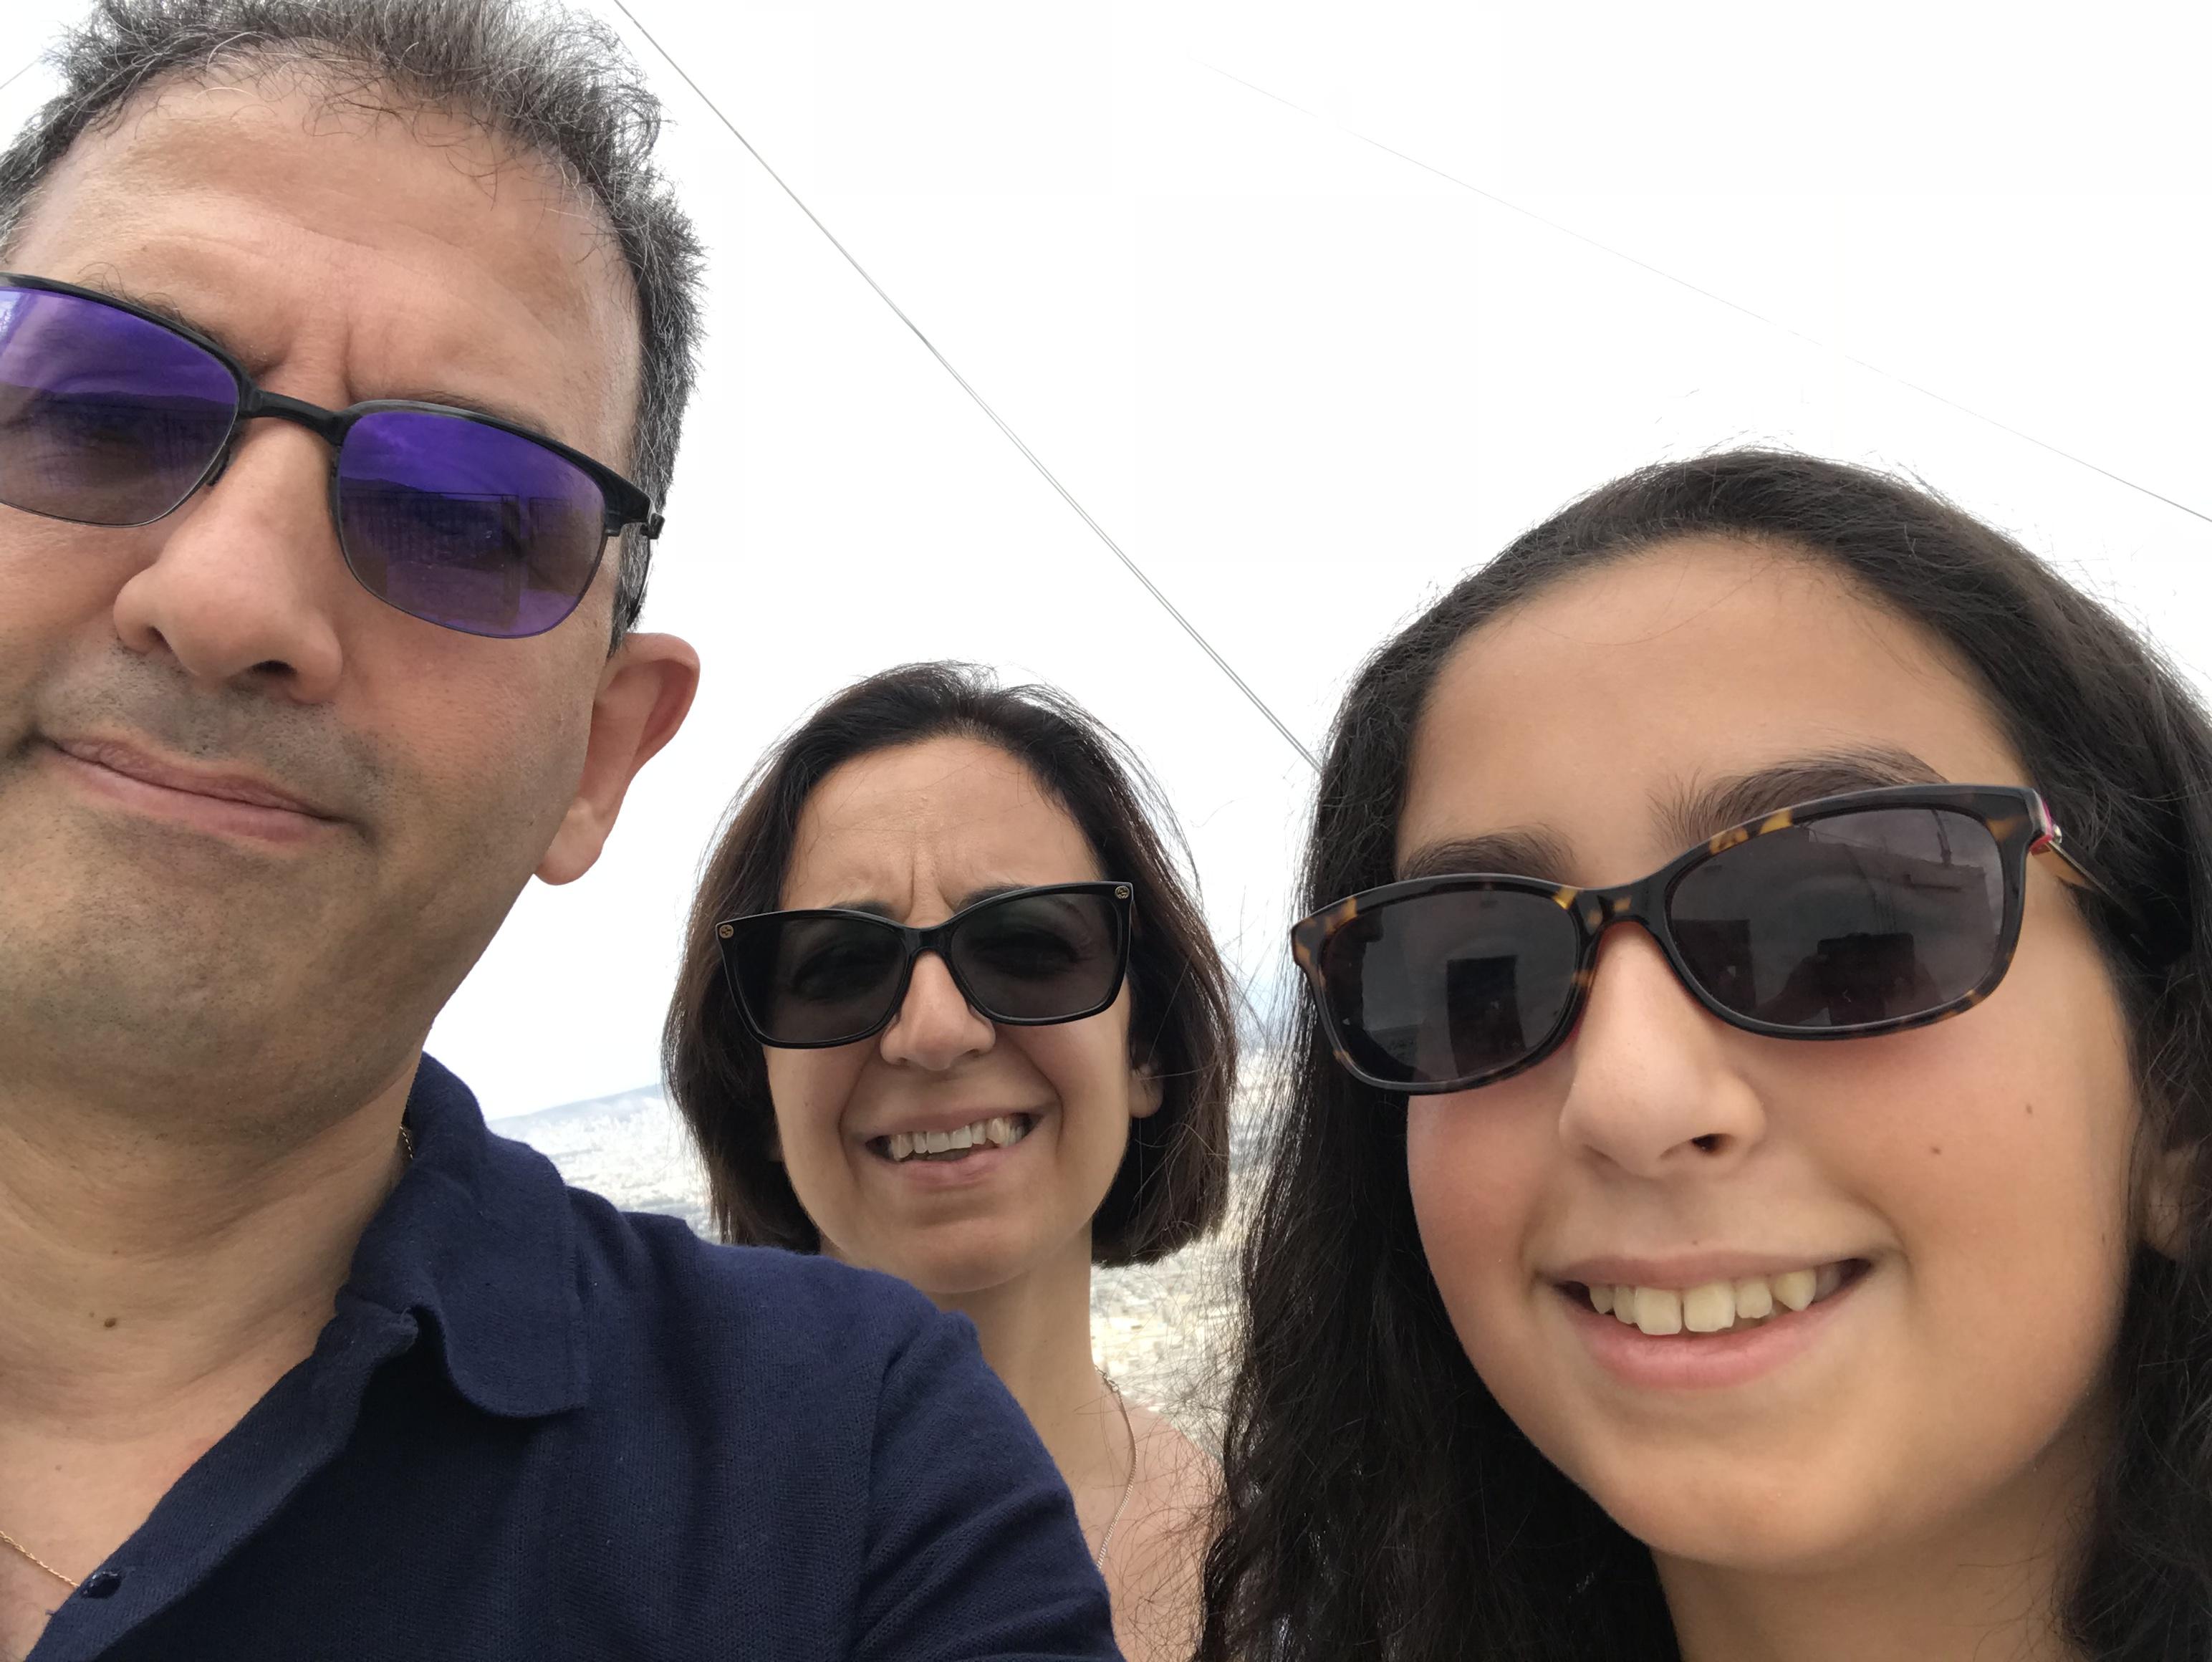 ray ban transition lenses sunglasses